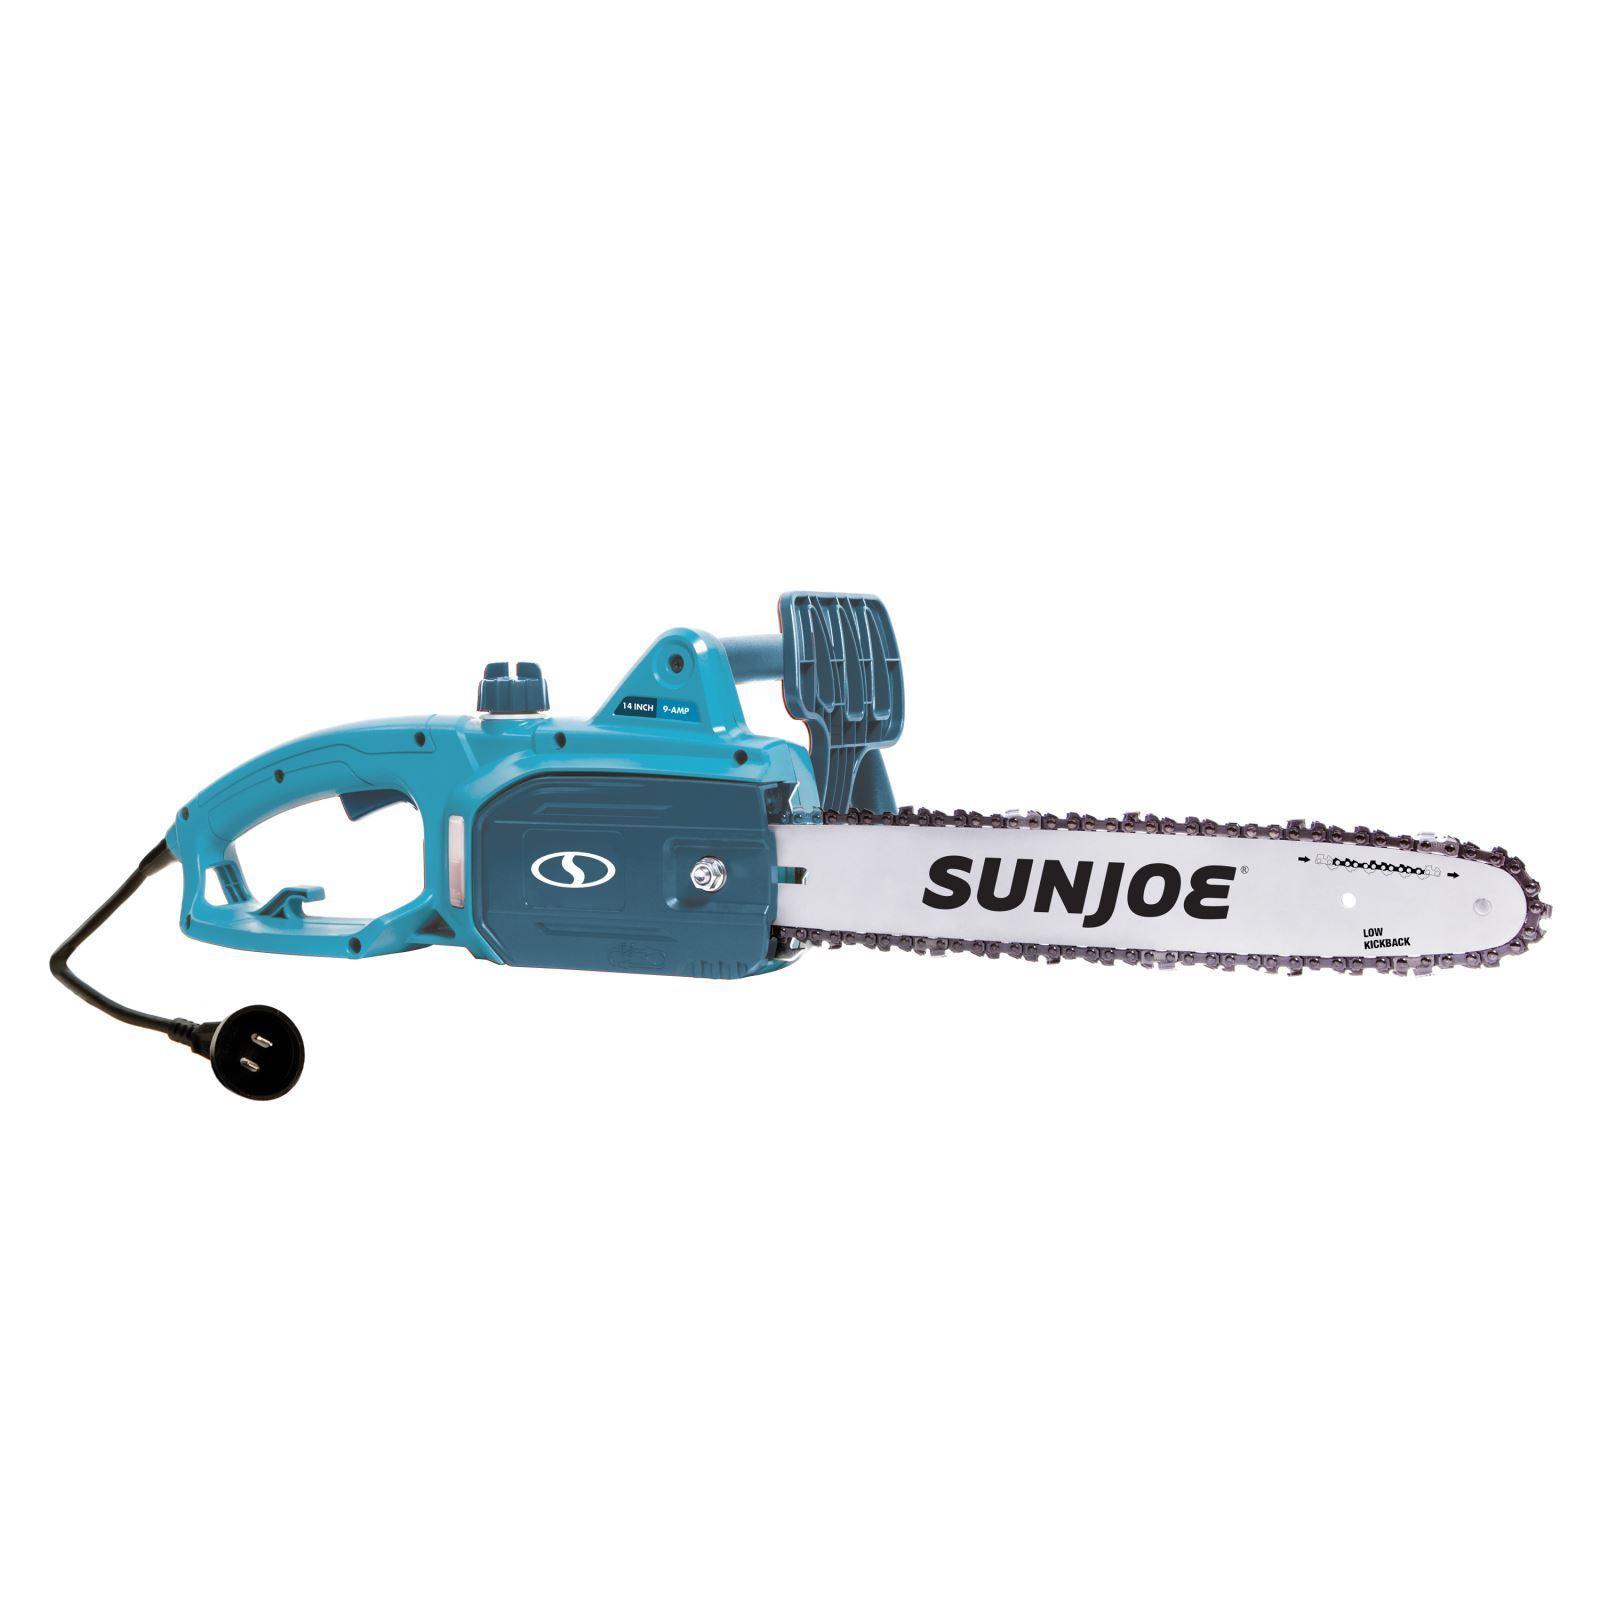 Sun Joe 14-Inch 9-Amp Electric Chain Saw (Blue) (Blue) (P...